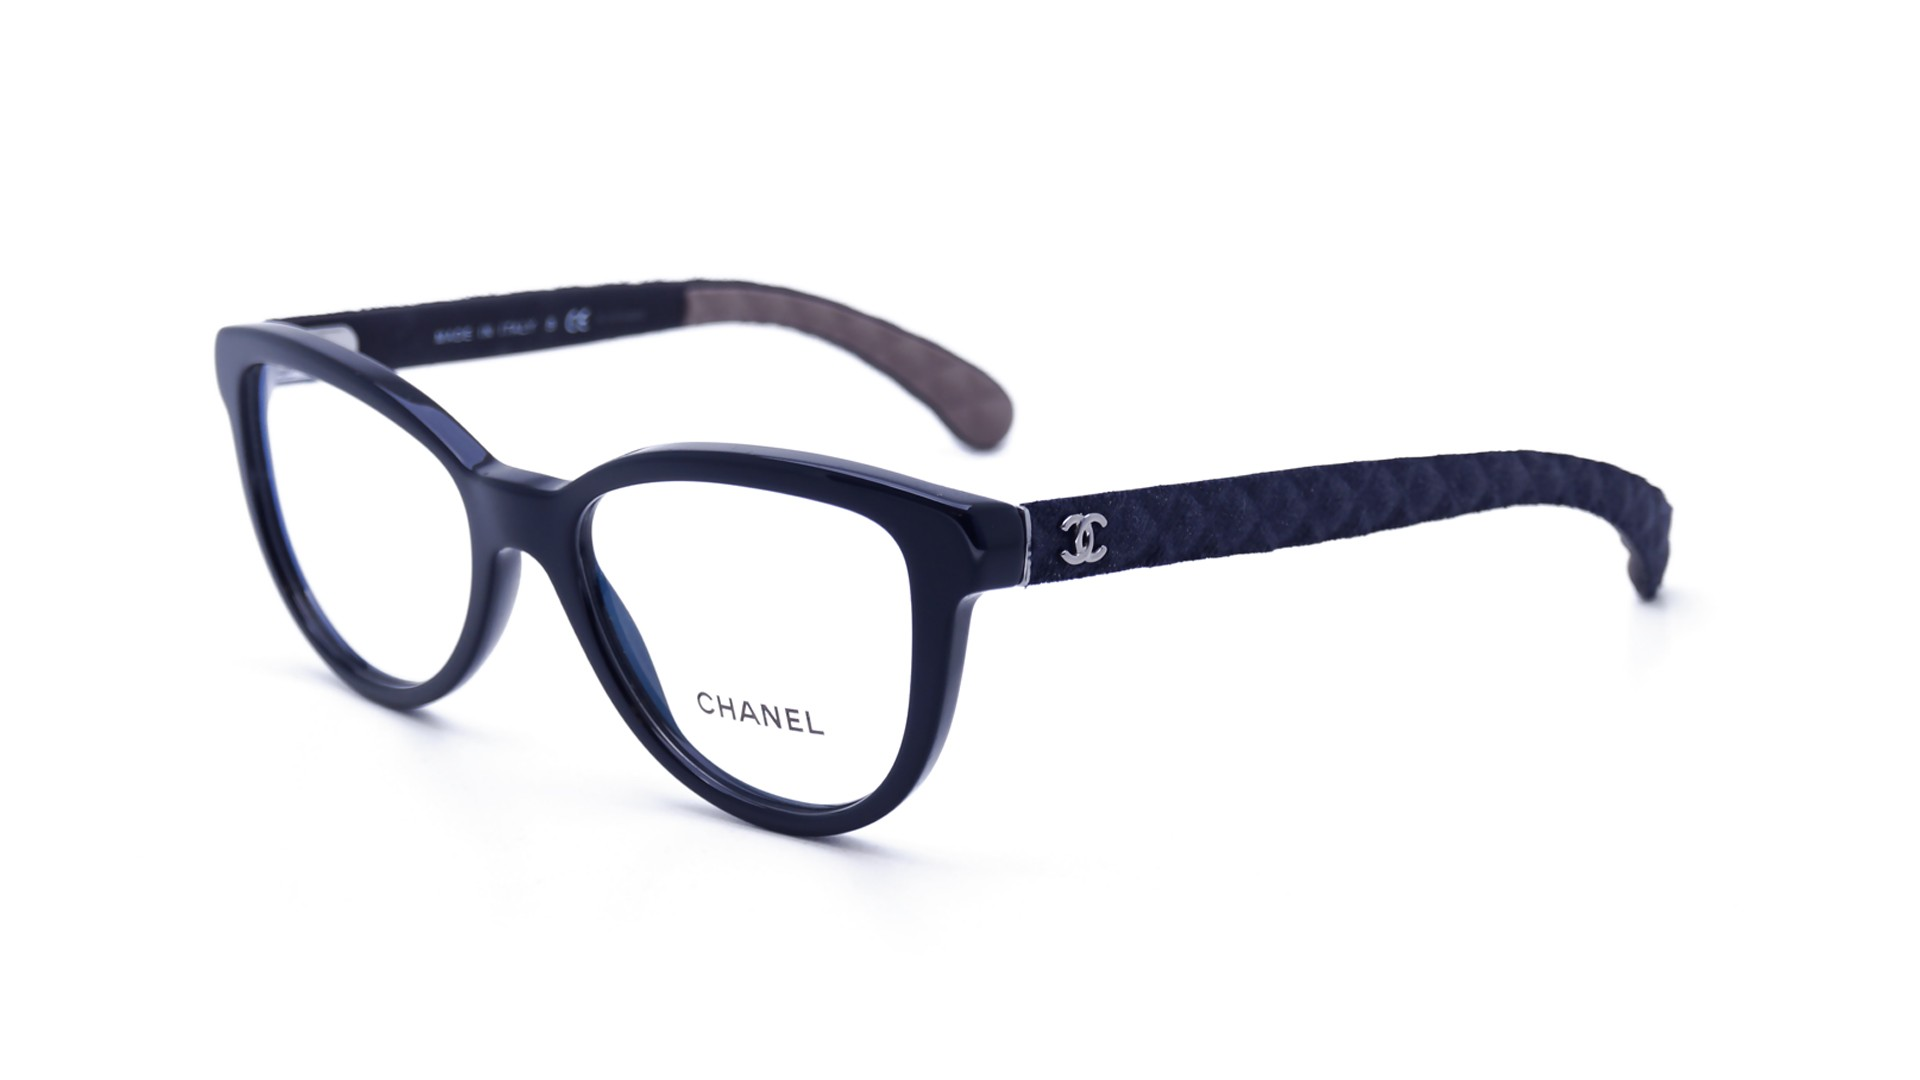 Chanel Glasses Asian Fit   SEMA Data Co-op